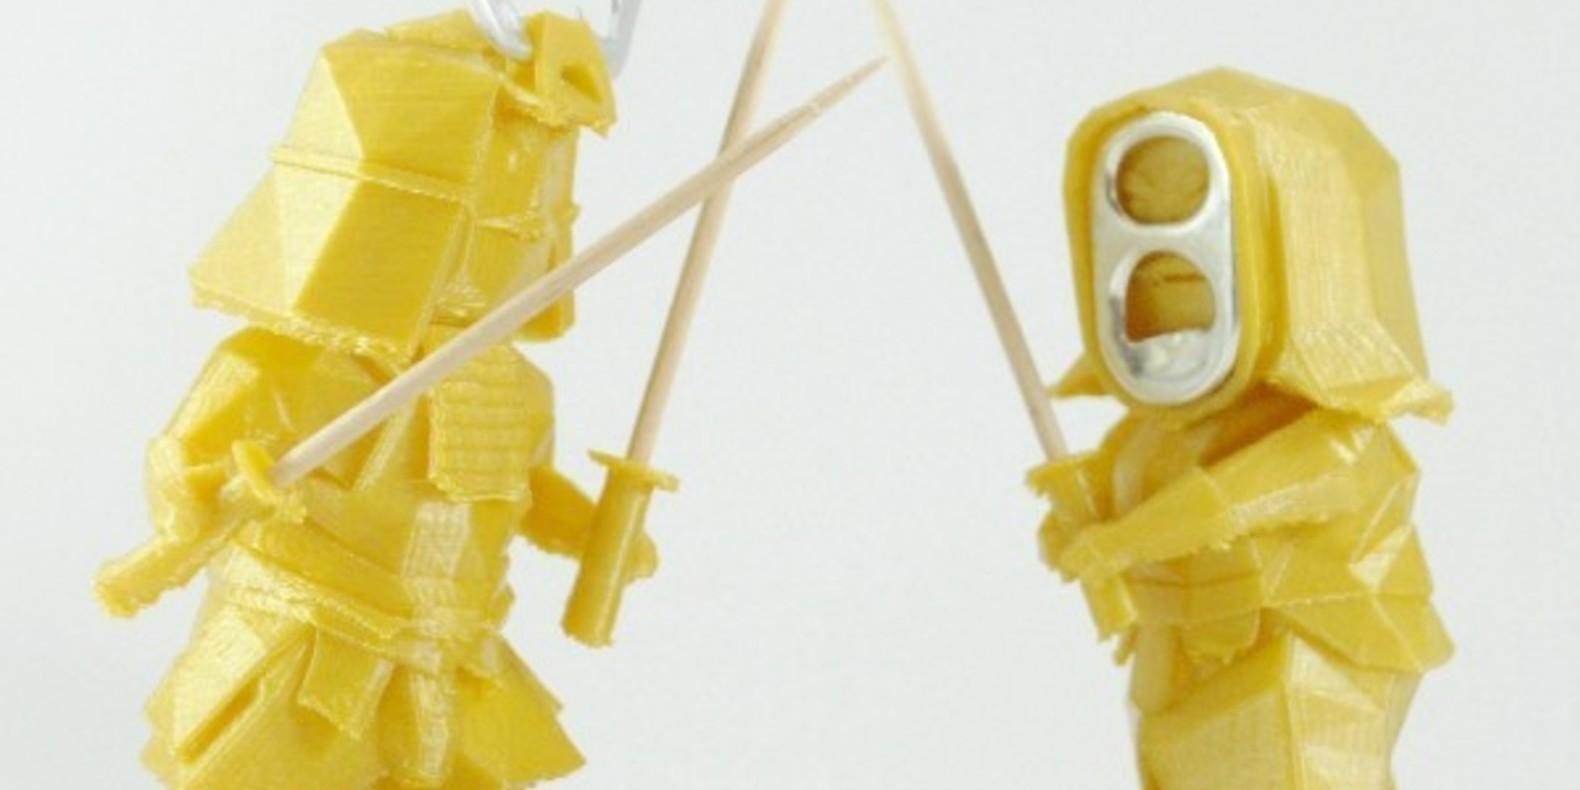 guerriers ninja cults 3D fichier 3D impression atomicosstudio tab capsule warriors